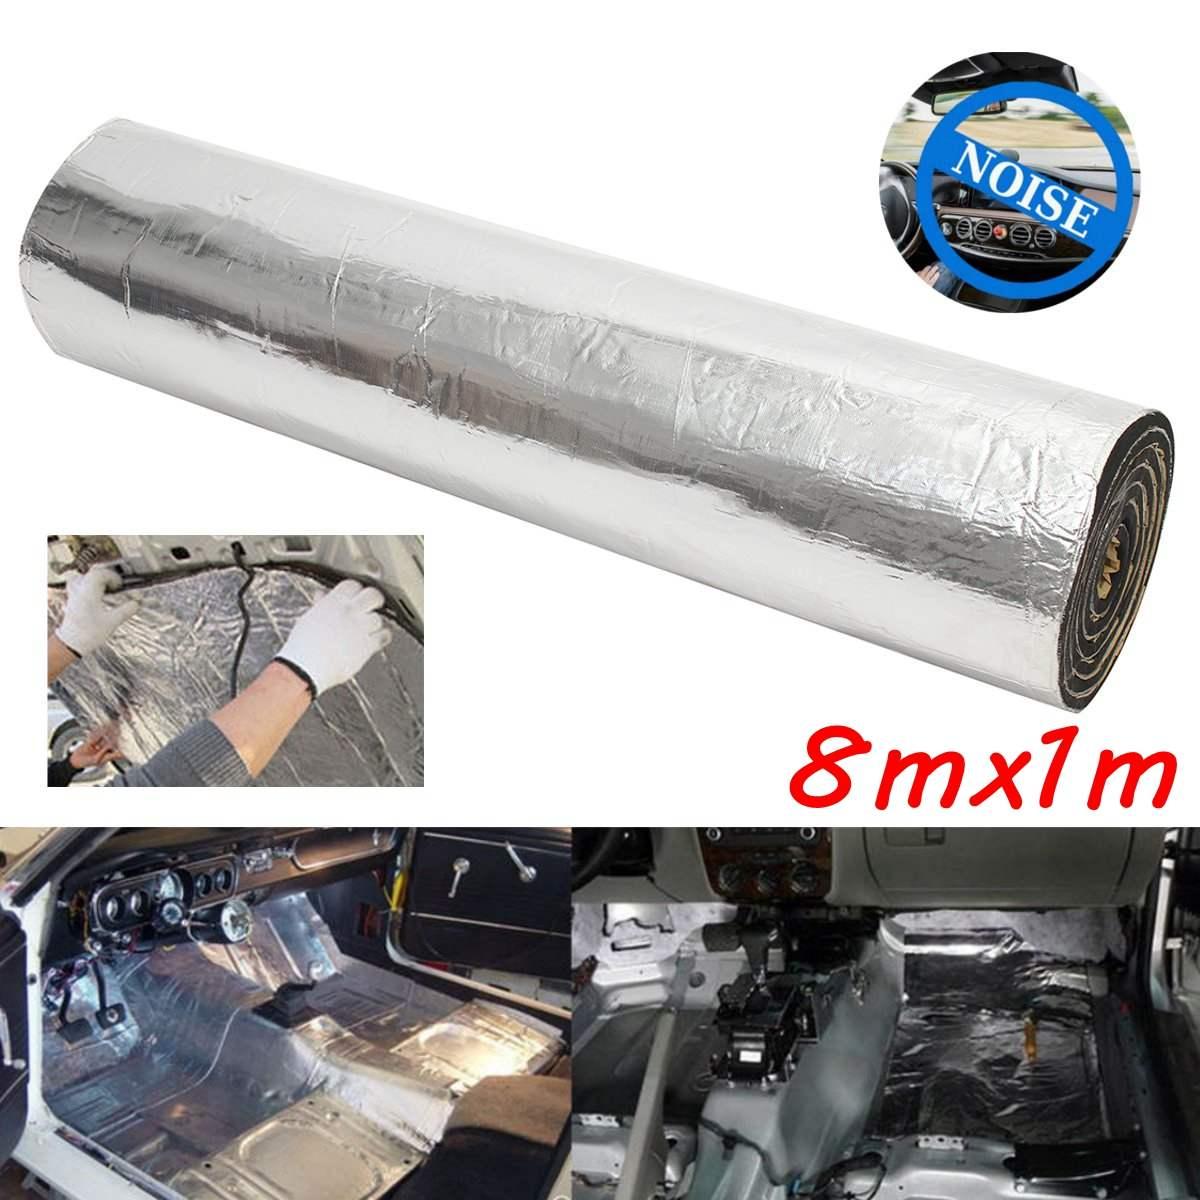 1M X 8M 5mm Car Truck Firewall Heat Sound Deadener Insulation Mat Noise Insulation Wool Car Heat Sound Thermal Proofing Pad